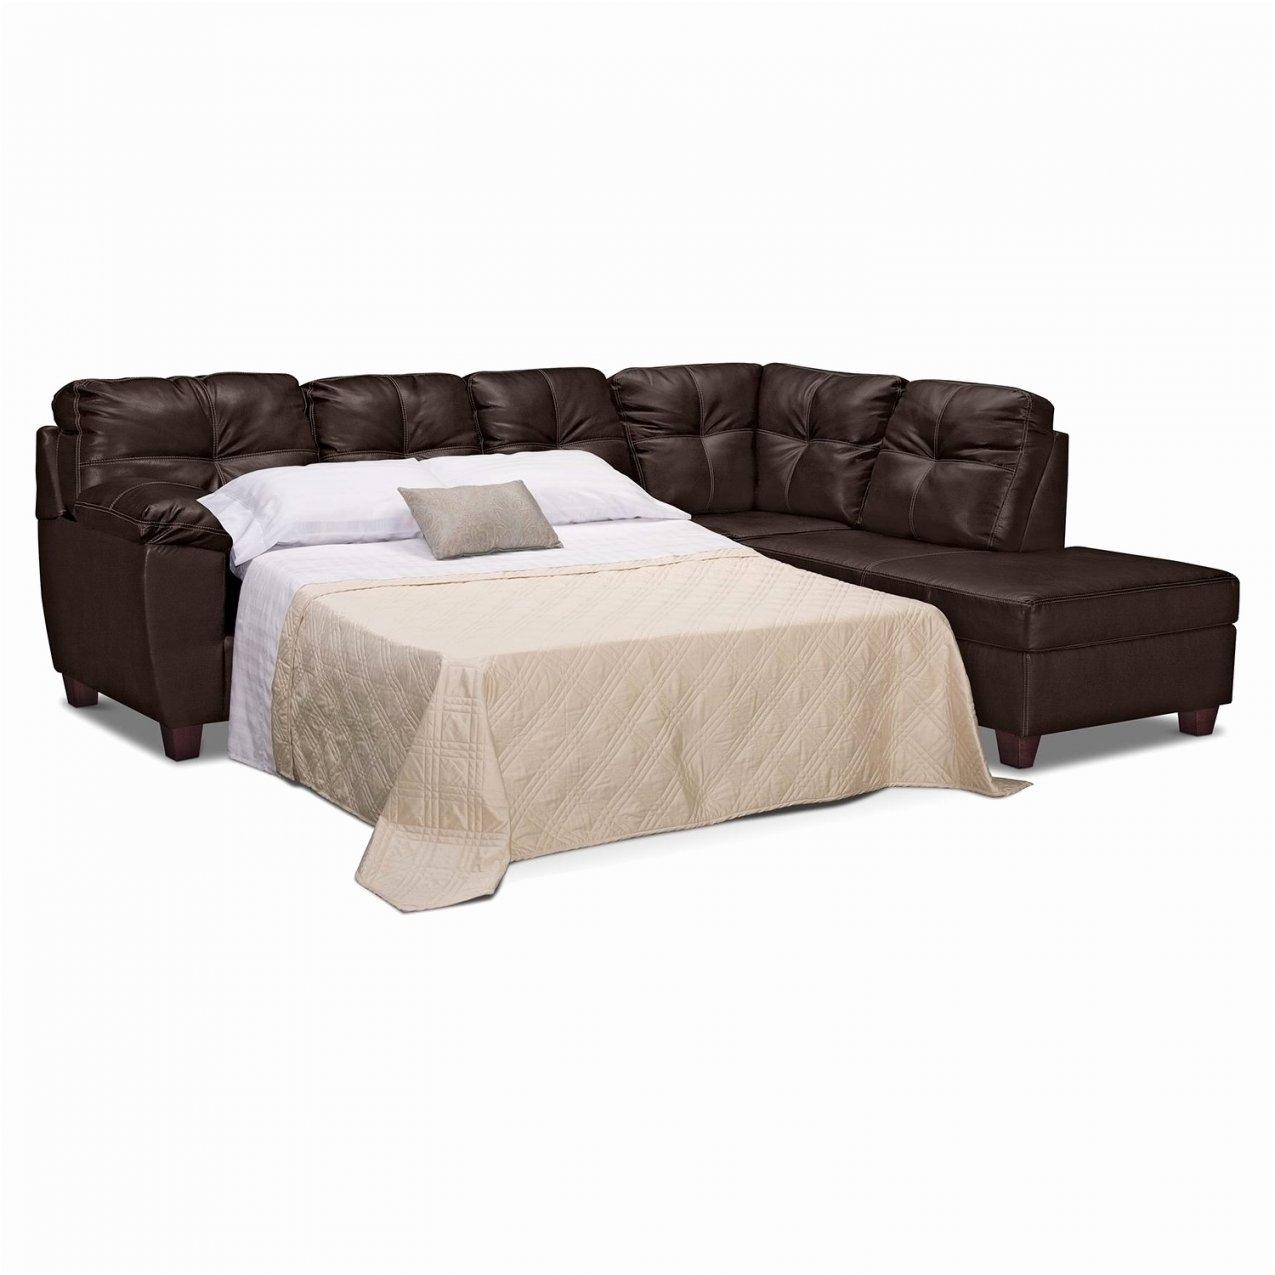 Sleeper Sofa Ikea Sectional Sofa Bed Fabric Sectional With Leather Inside Ikea Sectional Sleeper Sofas (Image 8 of 10)